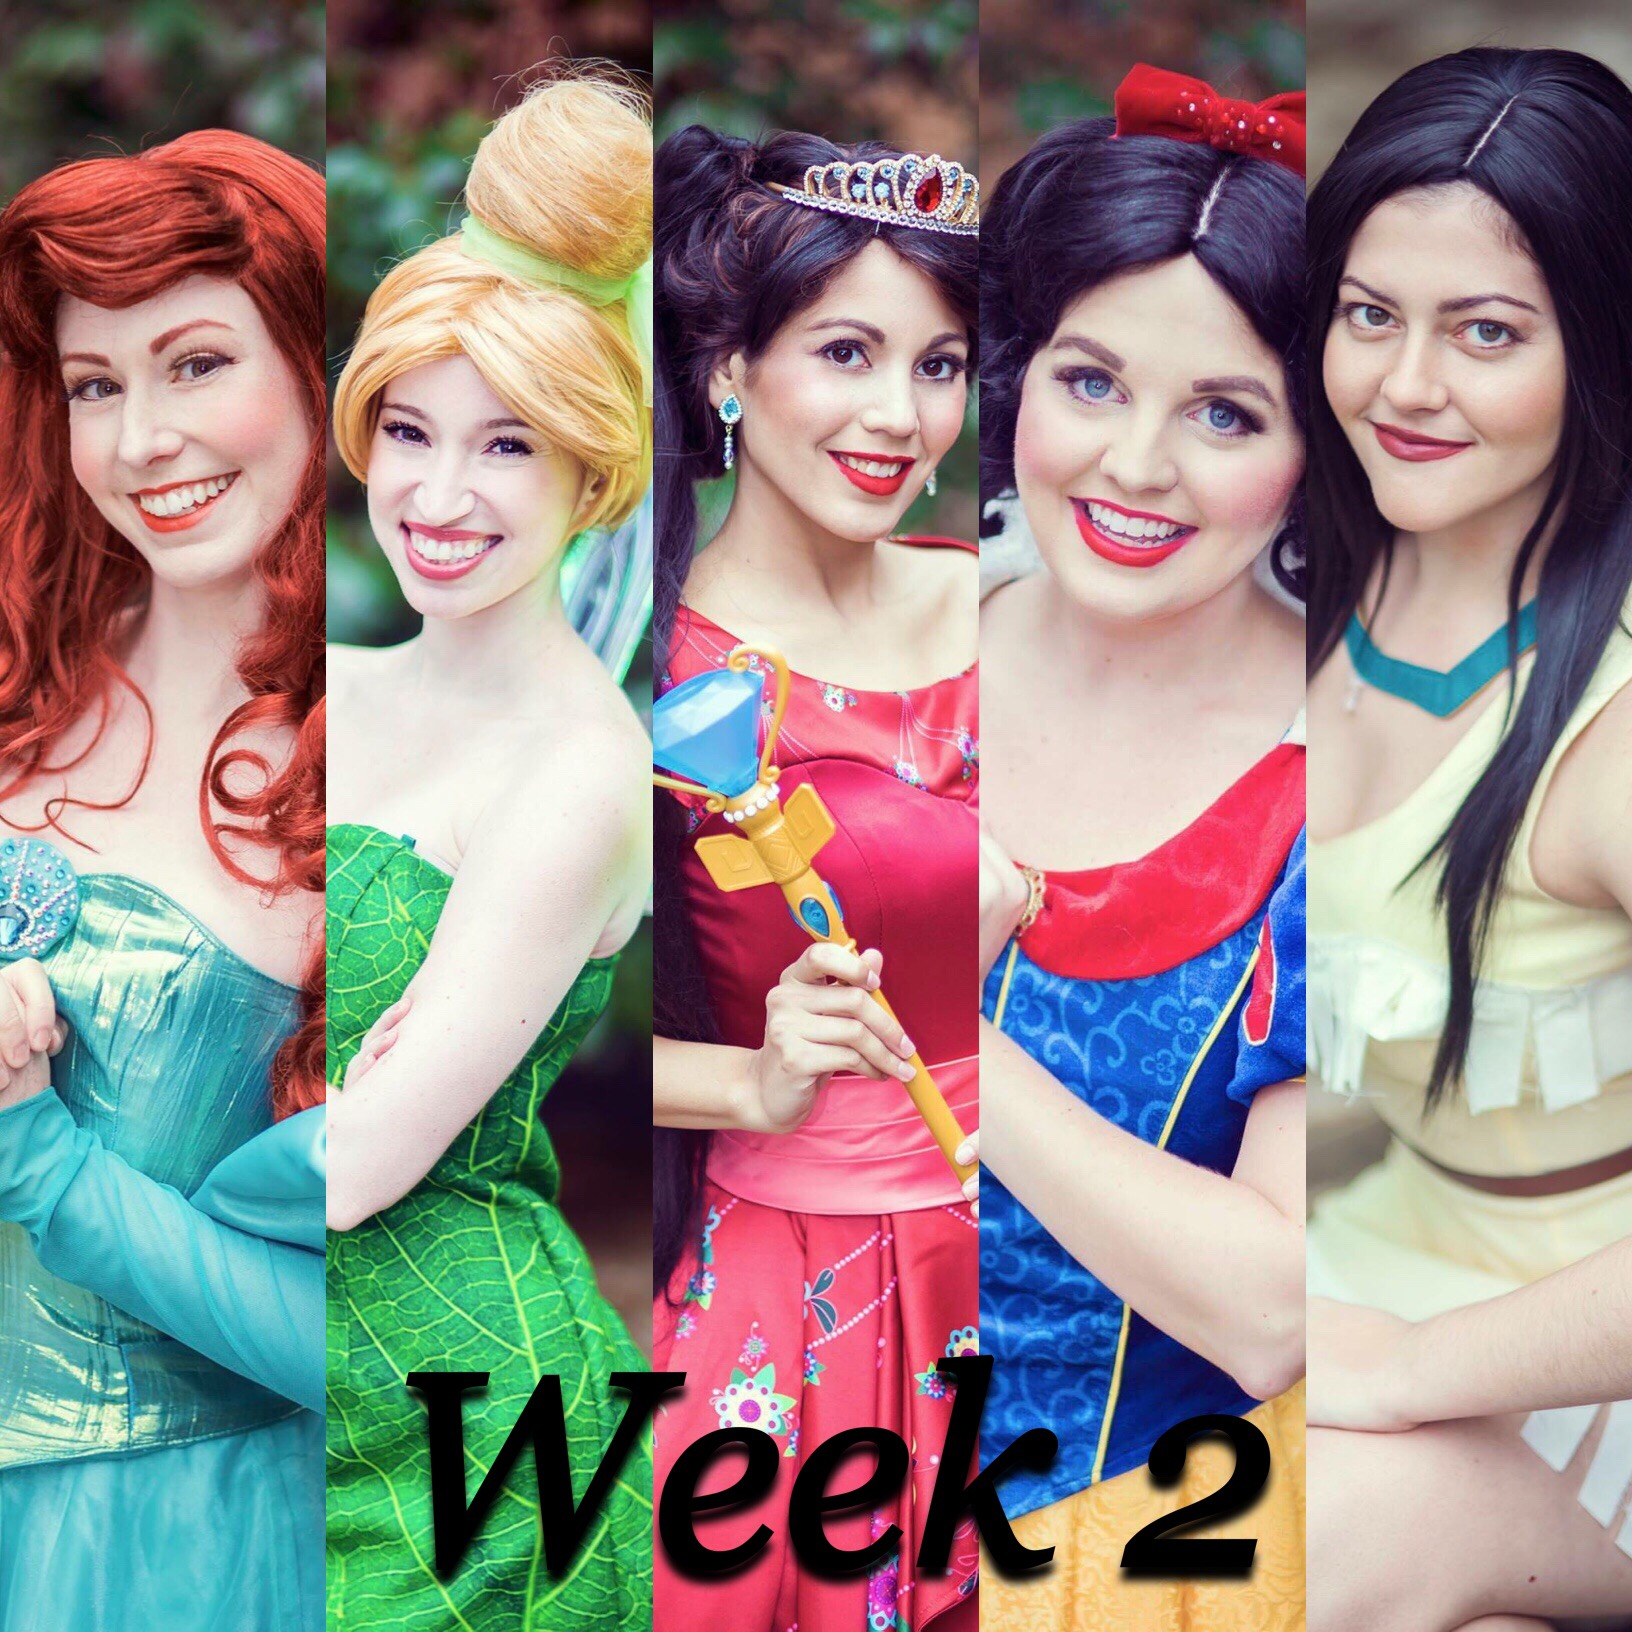 Week 2 Princess Camp